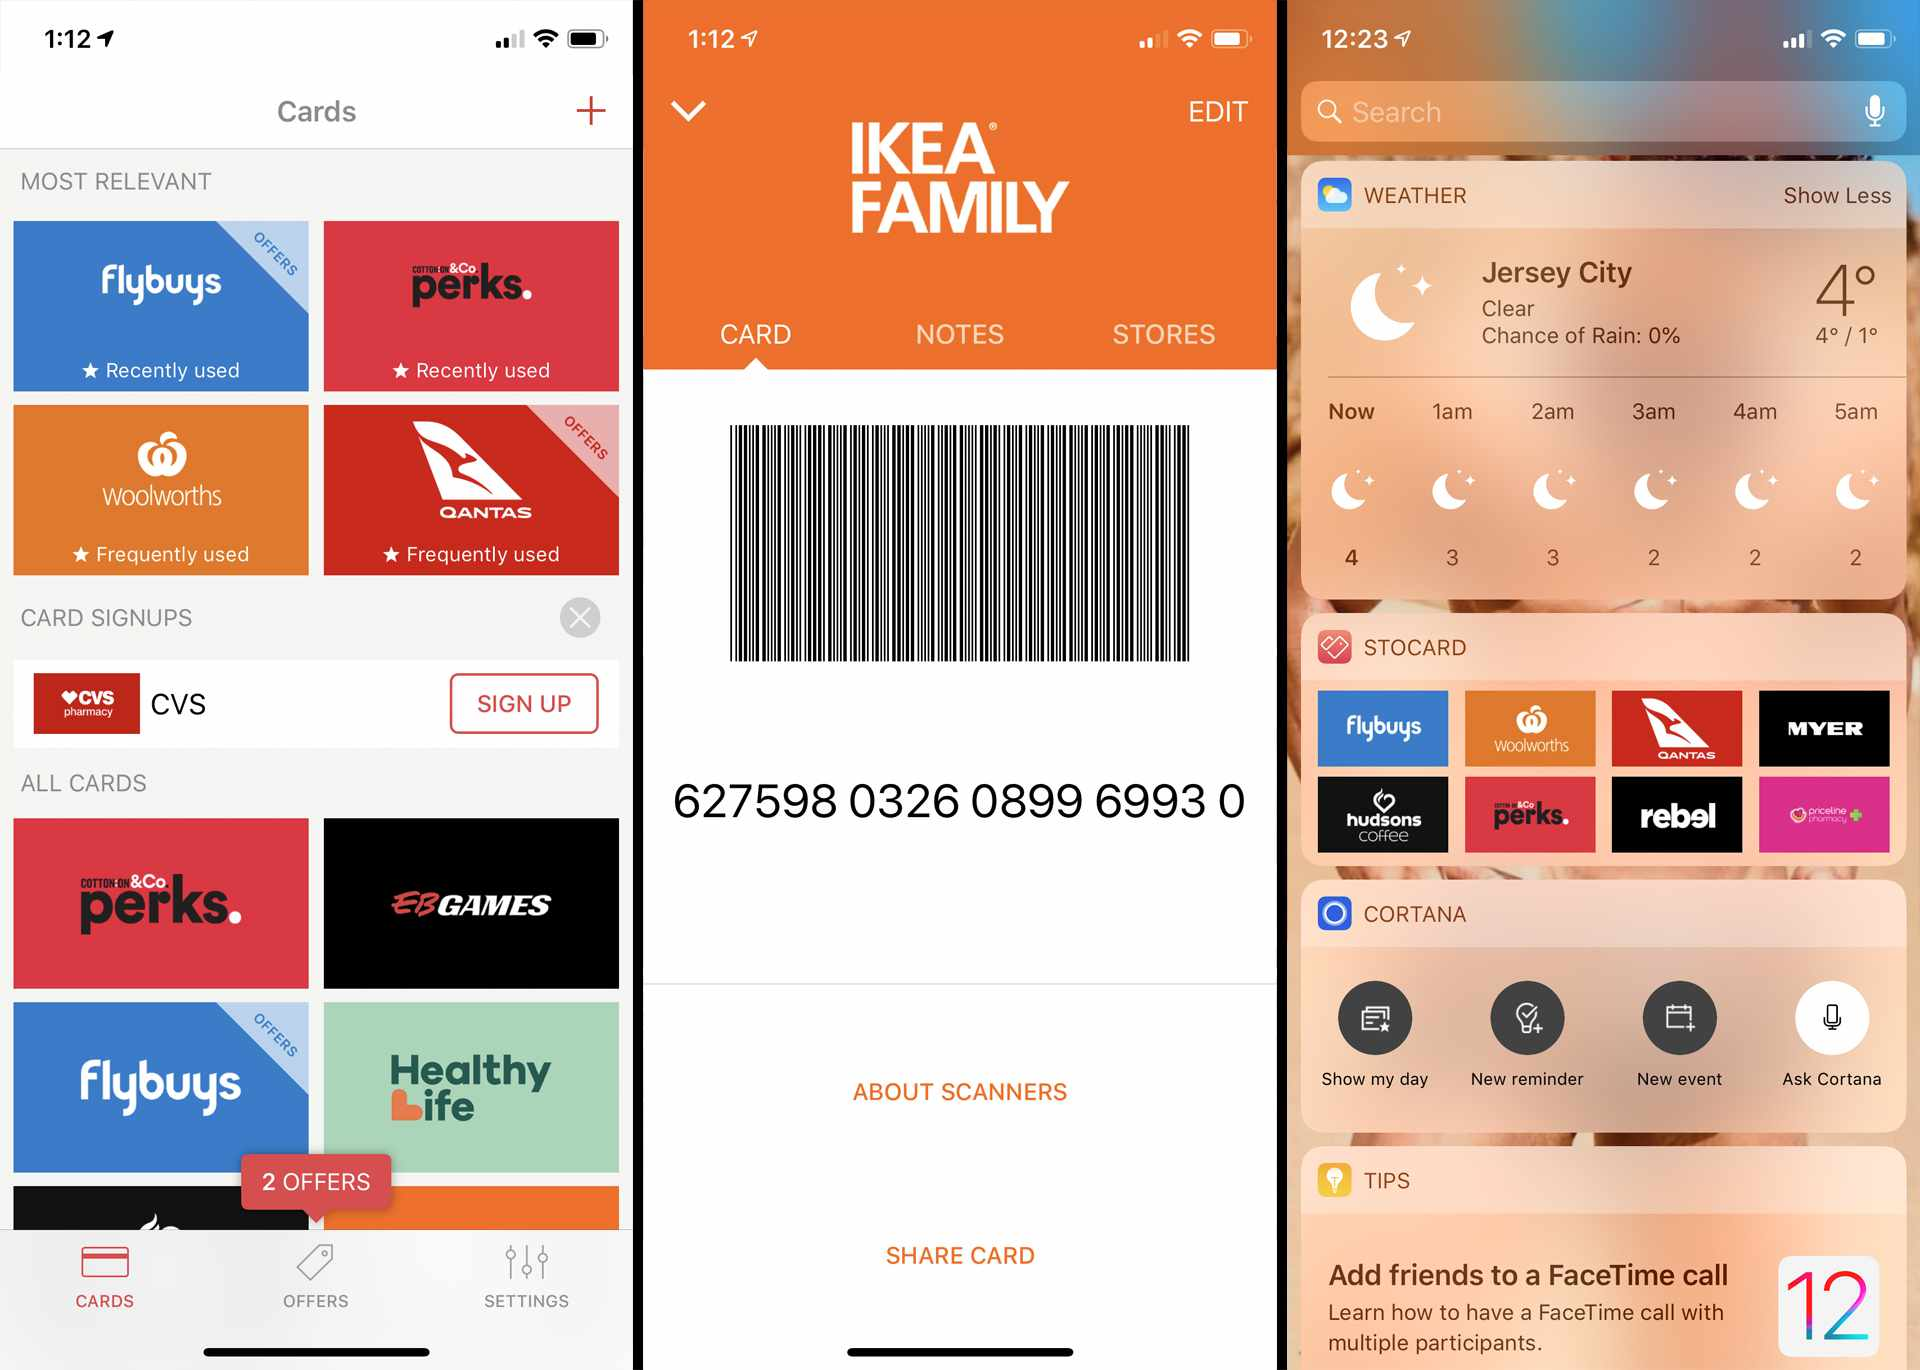 Stocard membership card app on iPhone.